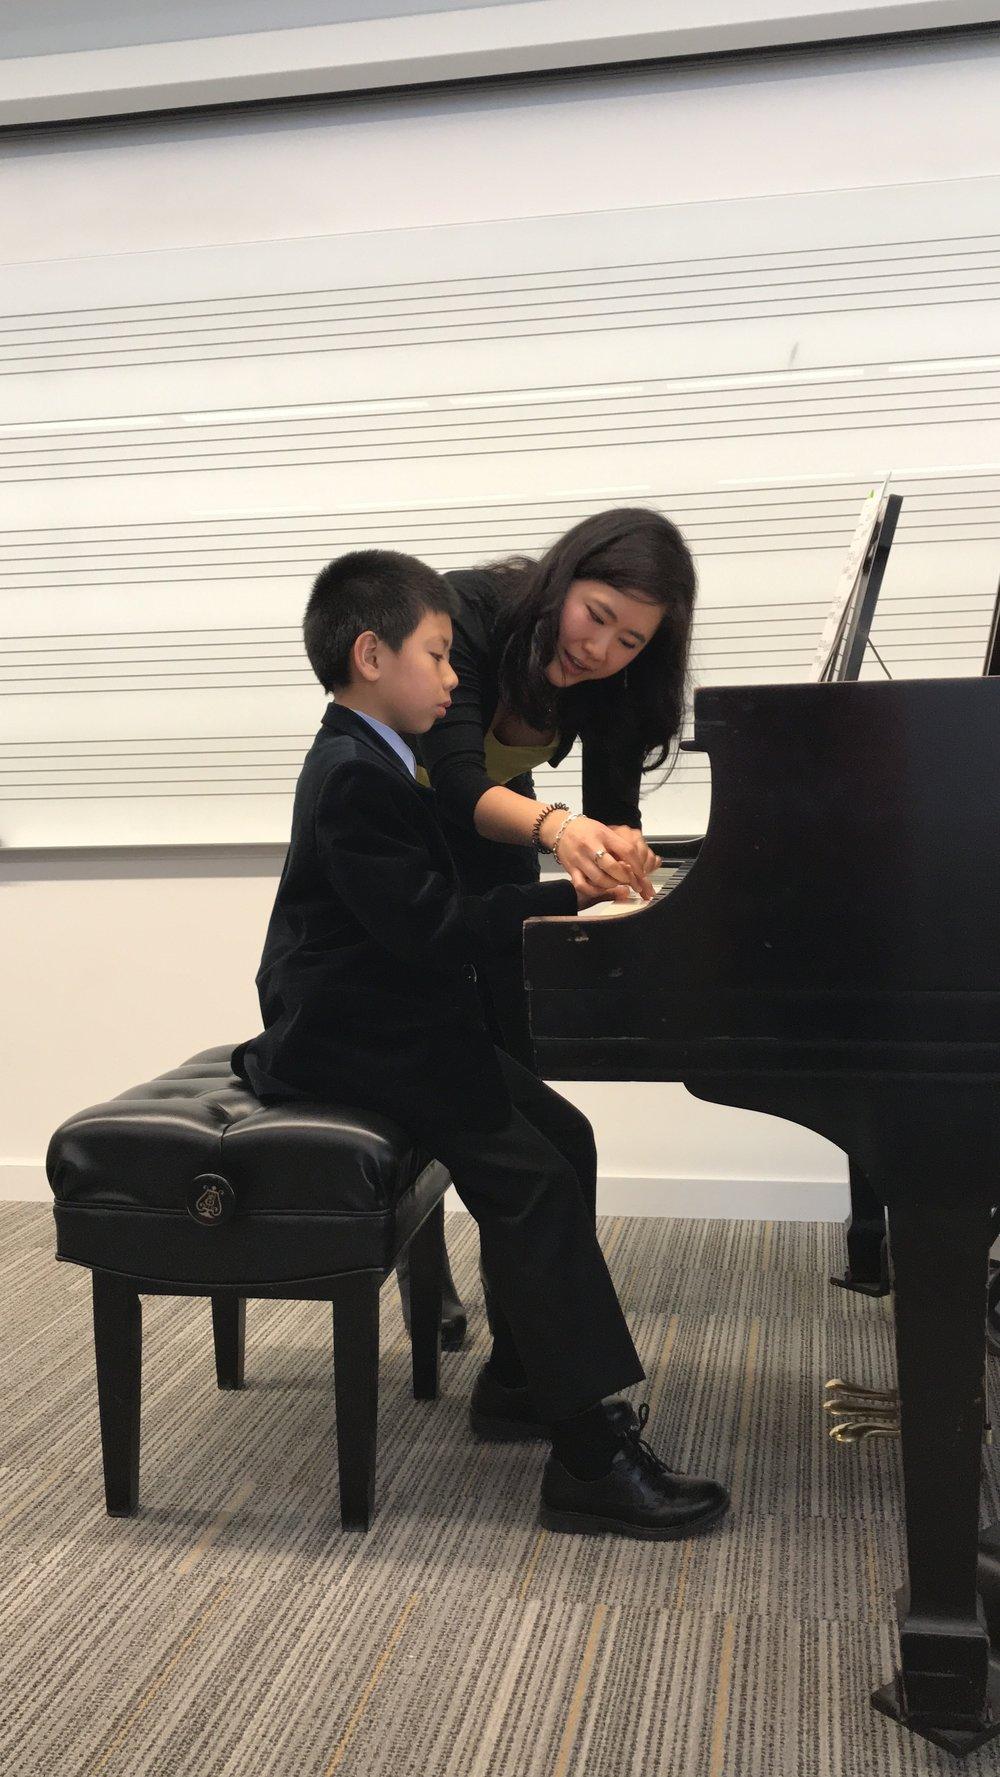 Masterclass at The University of Iowa Pre-College Piano Conservatory (Iowa City, IA)